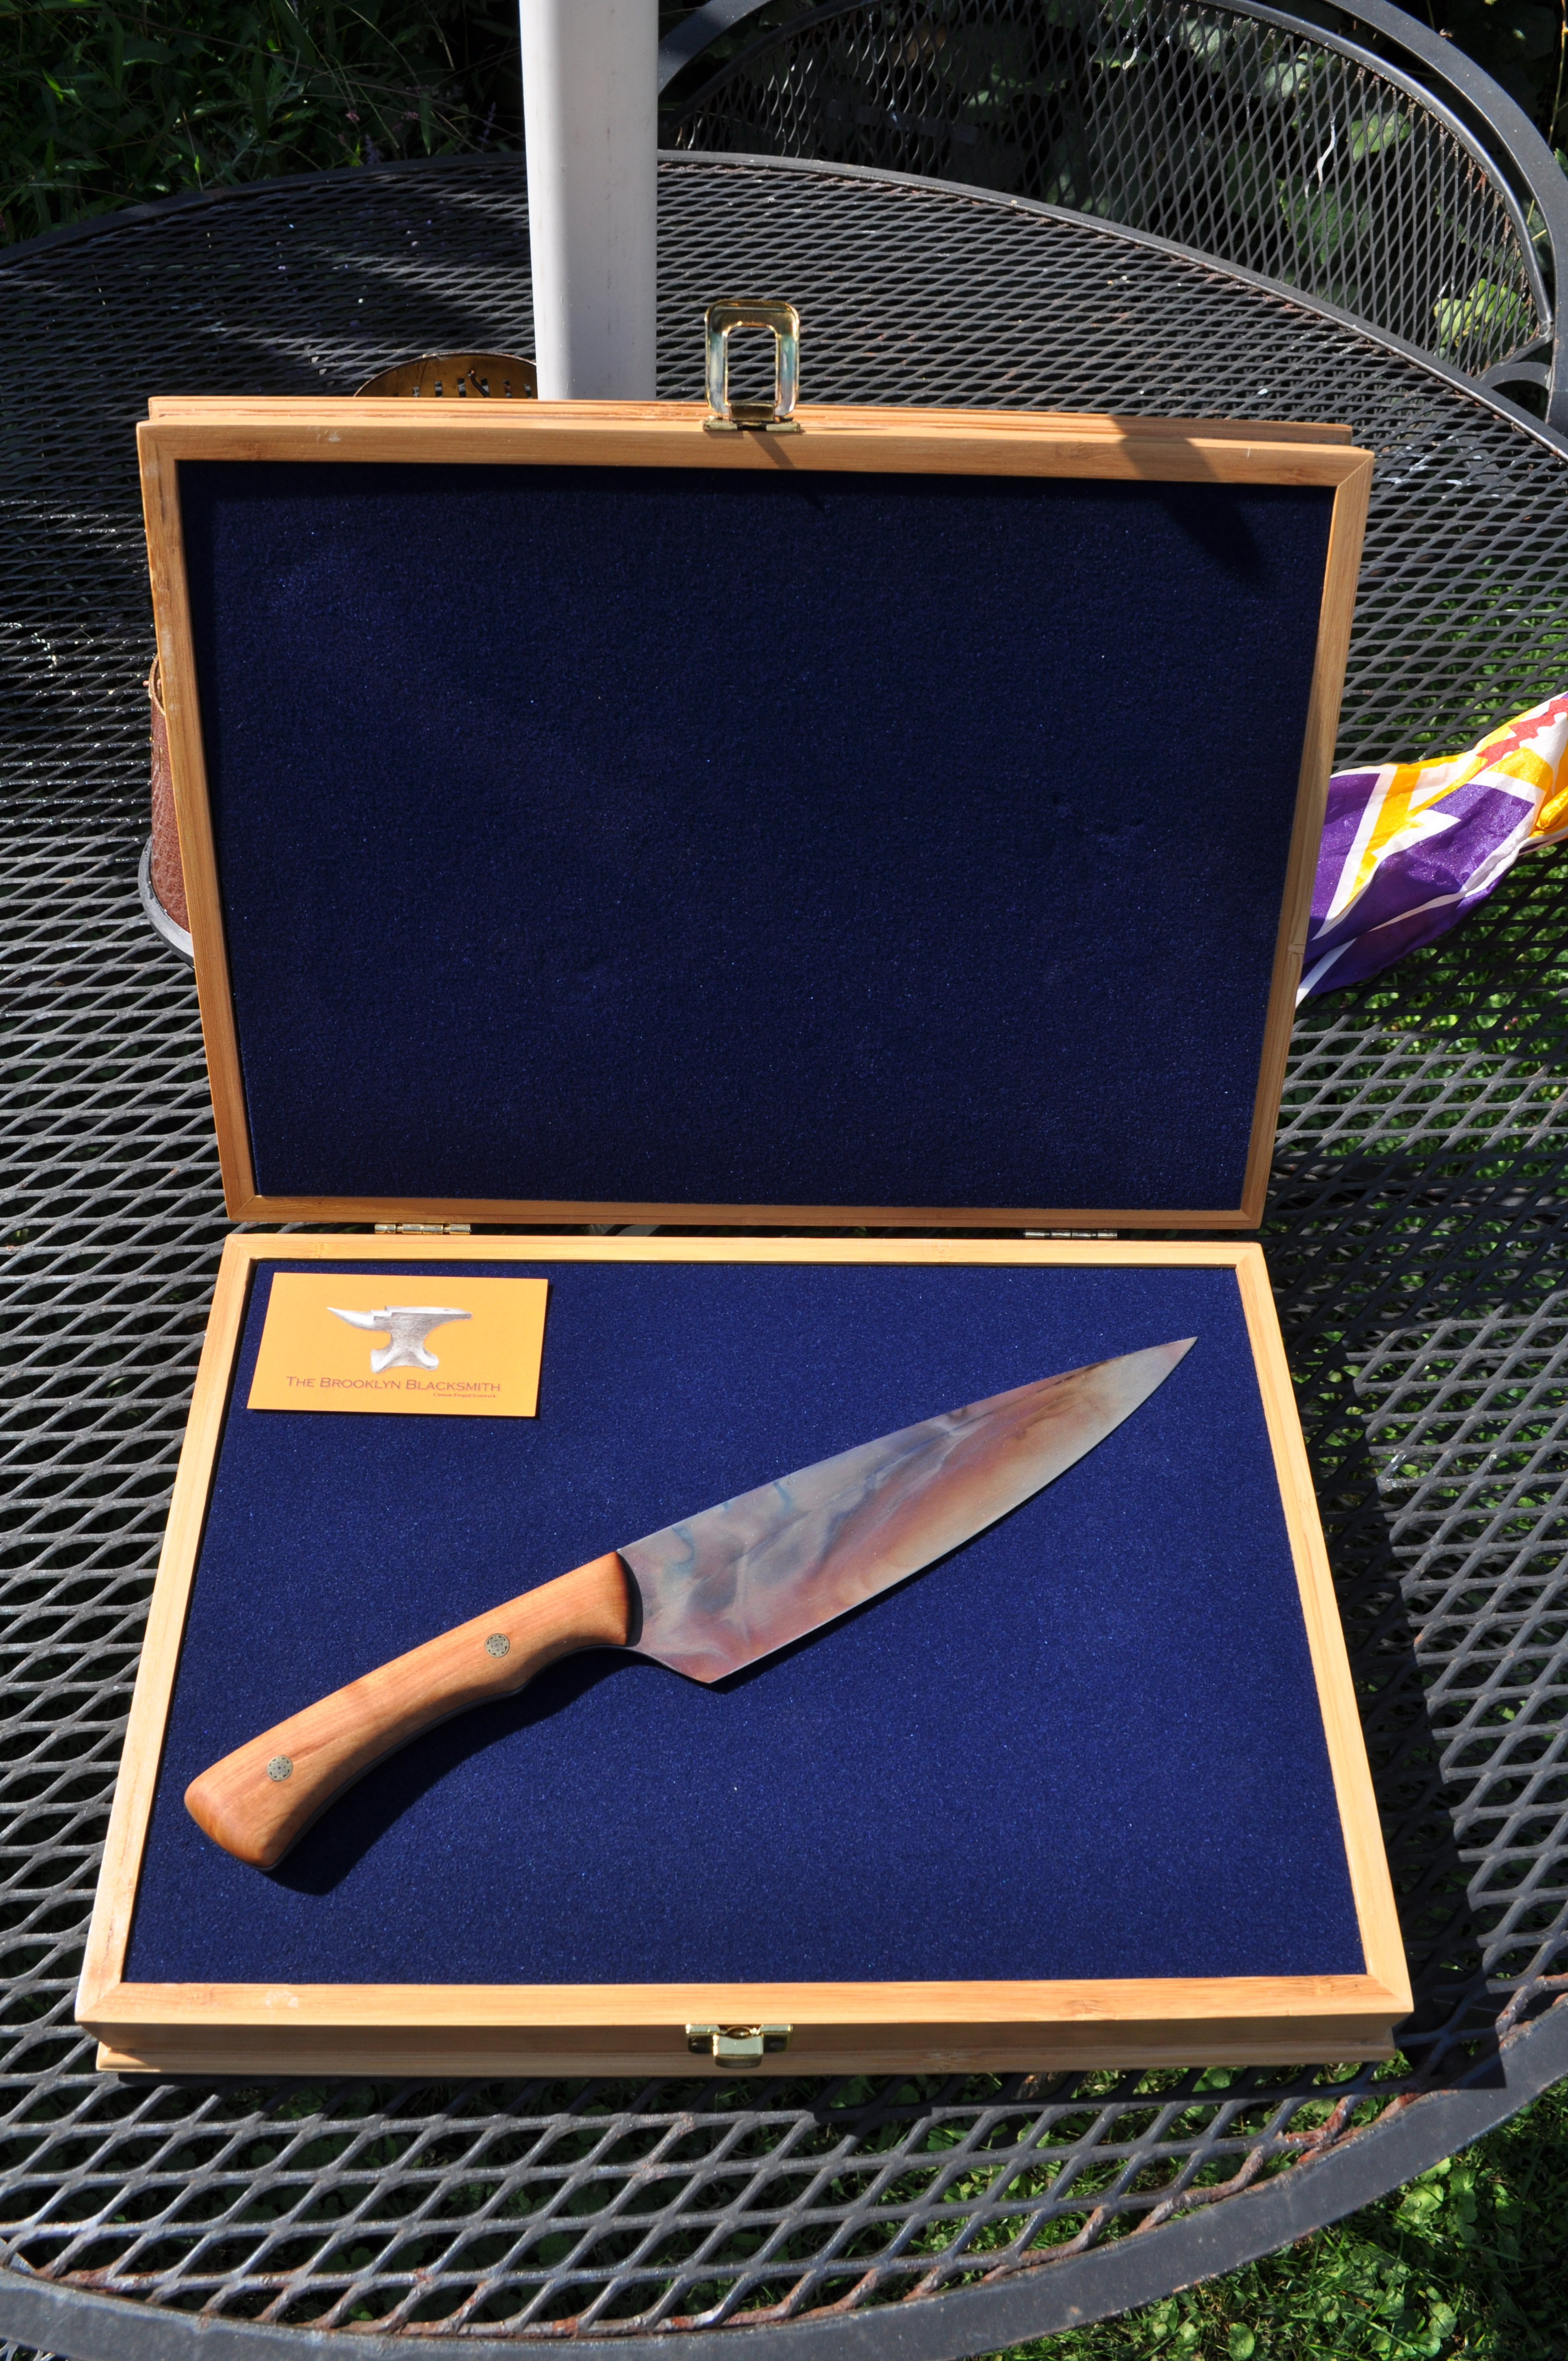 Valyrian Chef Knife #5